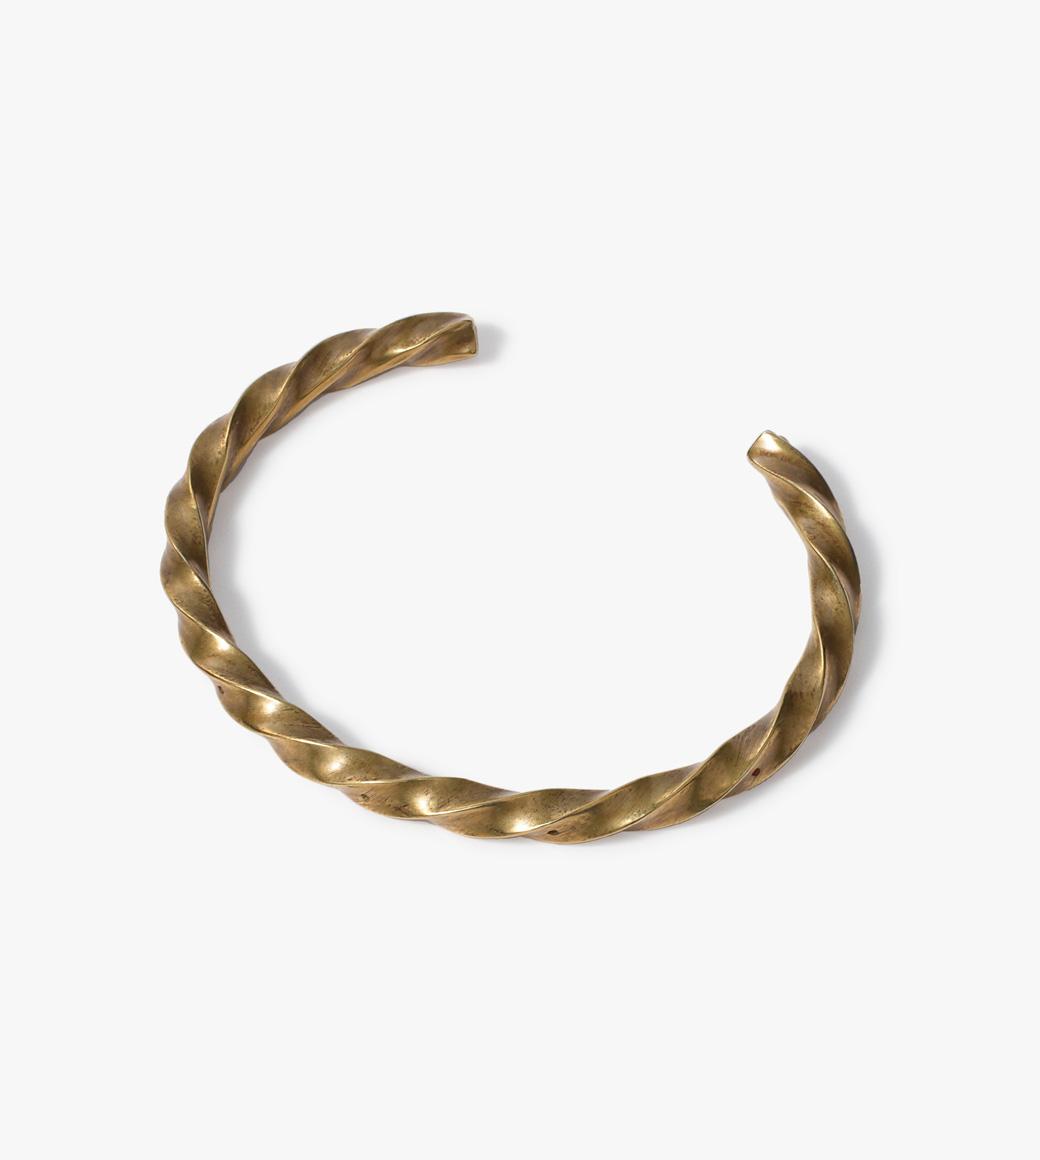 fashion jewelry skinny cuffs u0026 bangles umhsudd